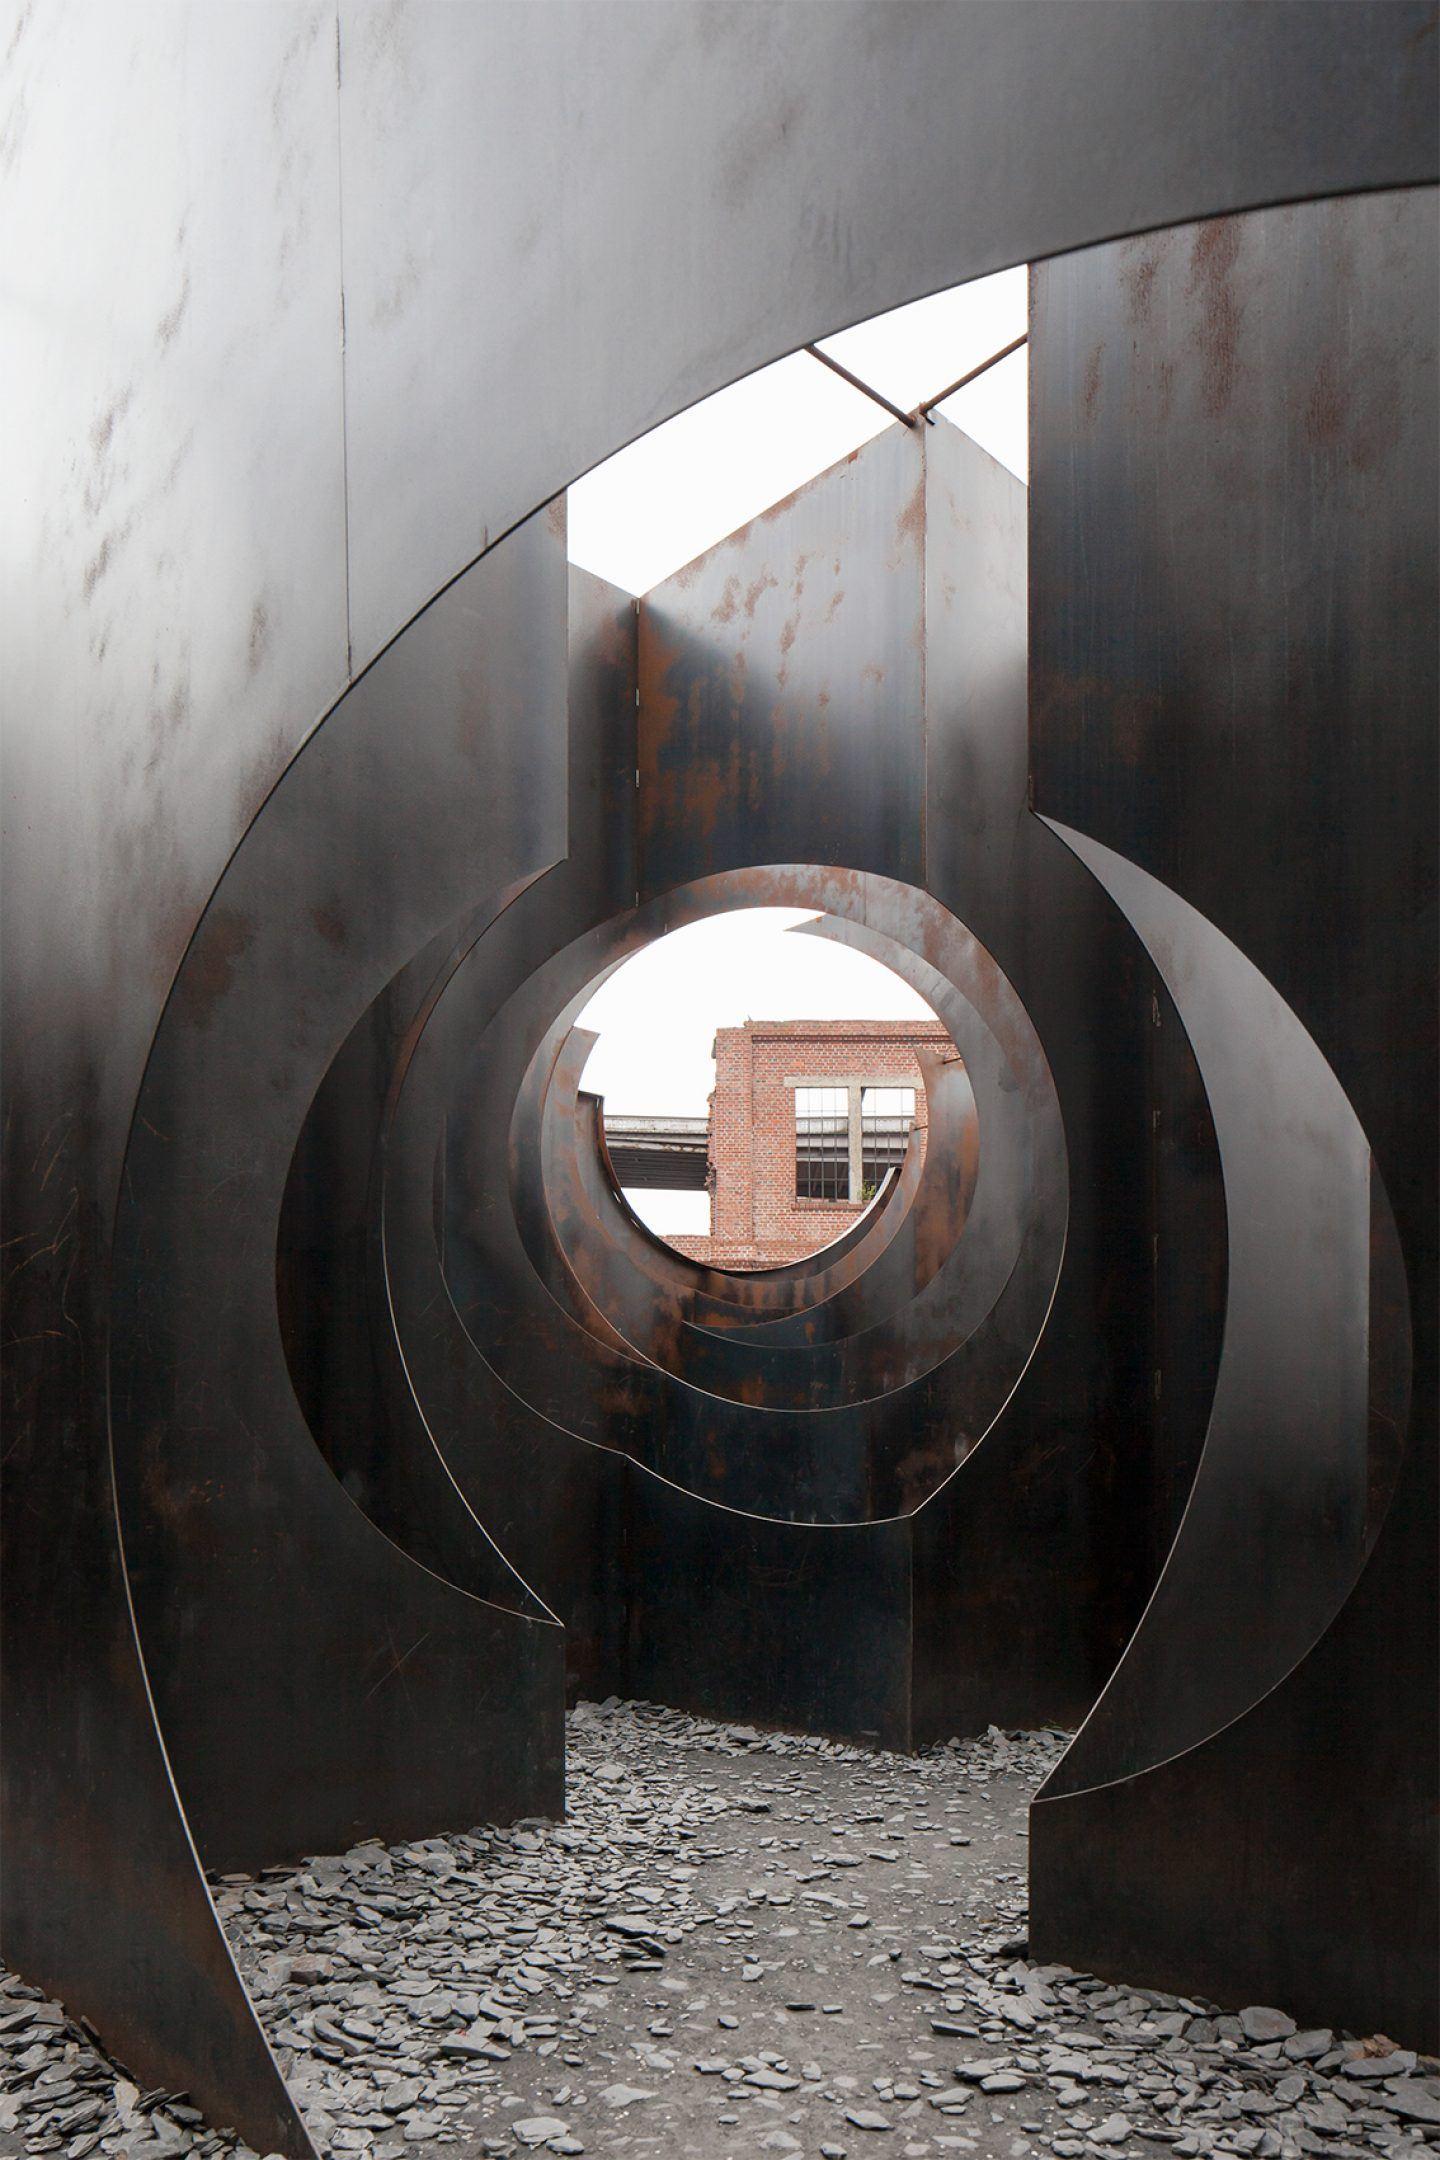 IGNANT-Architecture- Gijs-Van-Vaerenbergh-Labyrinth-Johnny-Umans-010